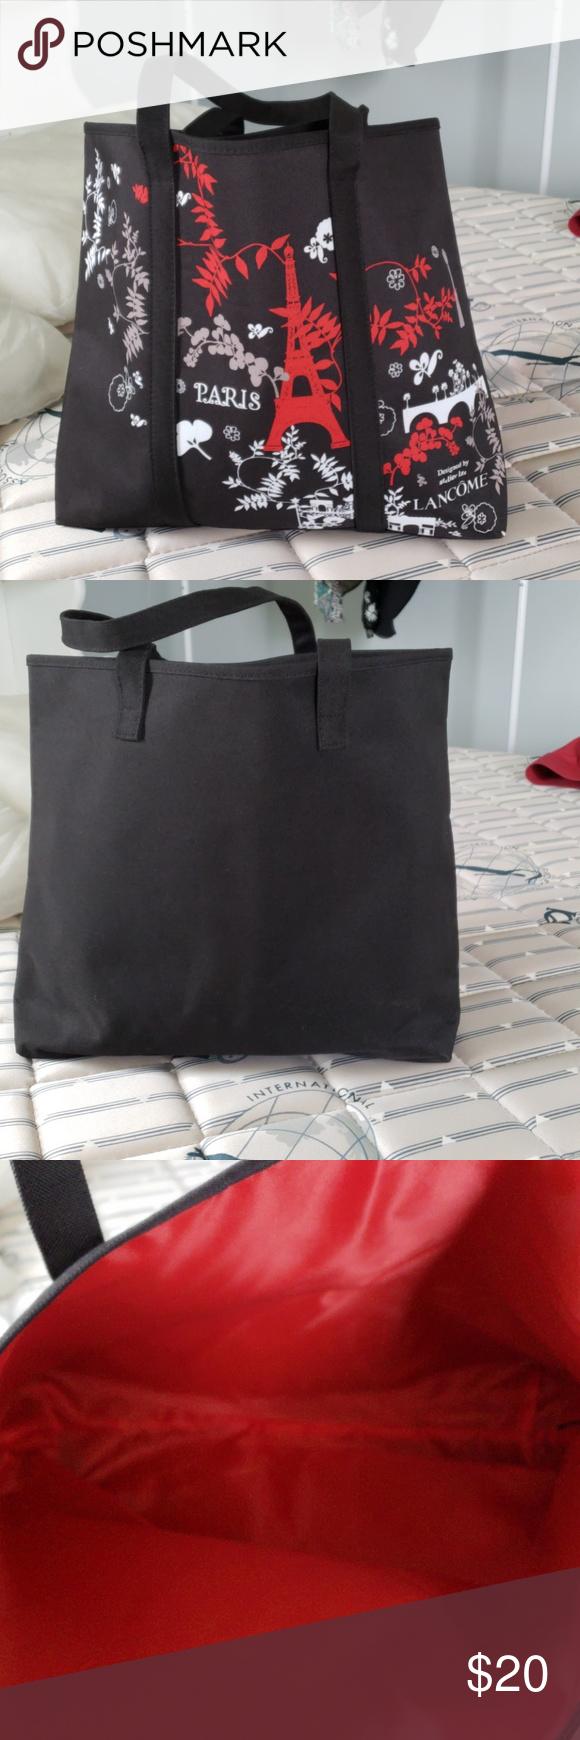 Nwot Lancome Tote Bag Regular Size Tote Bag Bags Clothes Design